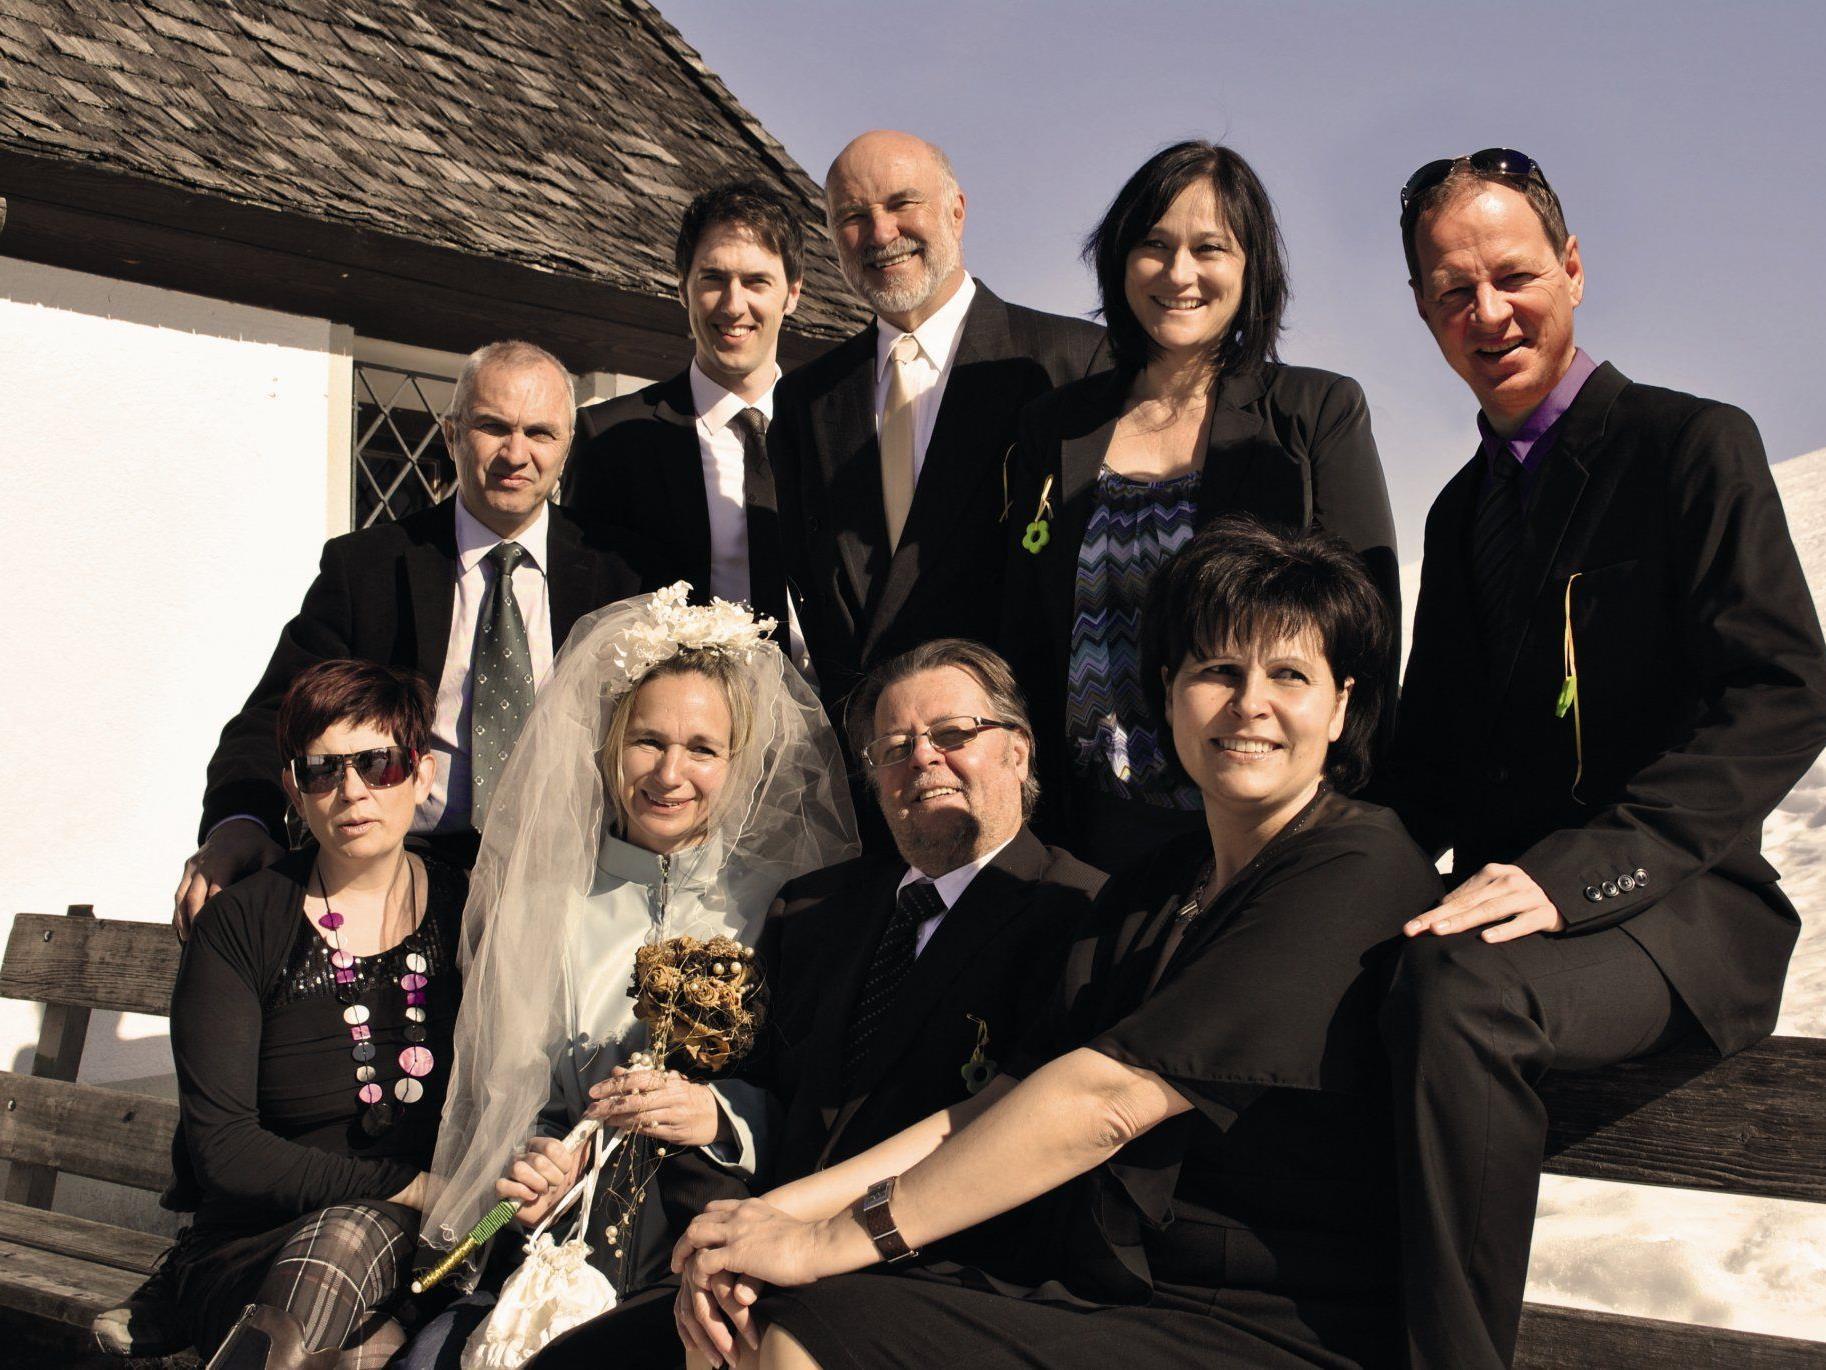 Das Frödischtheater als illustre Hochzeitsgesellschaft